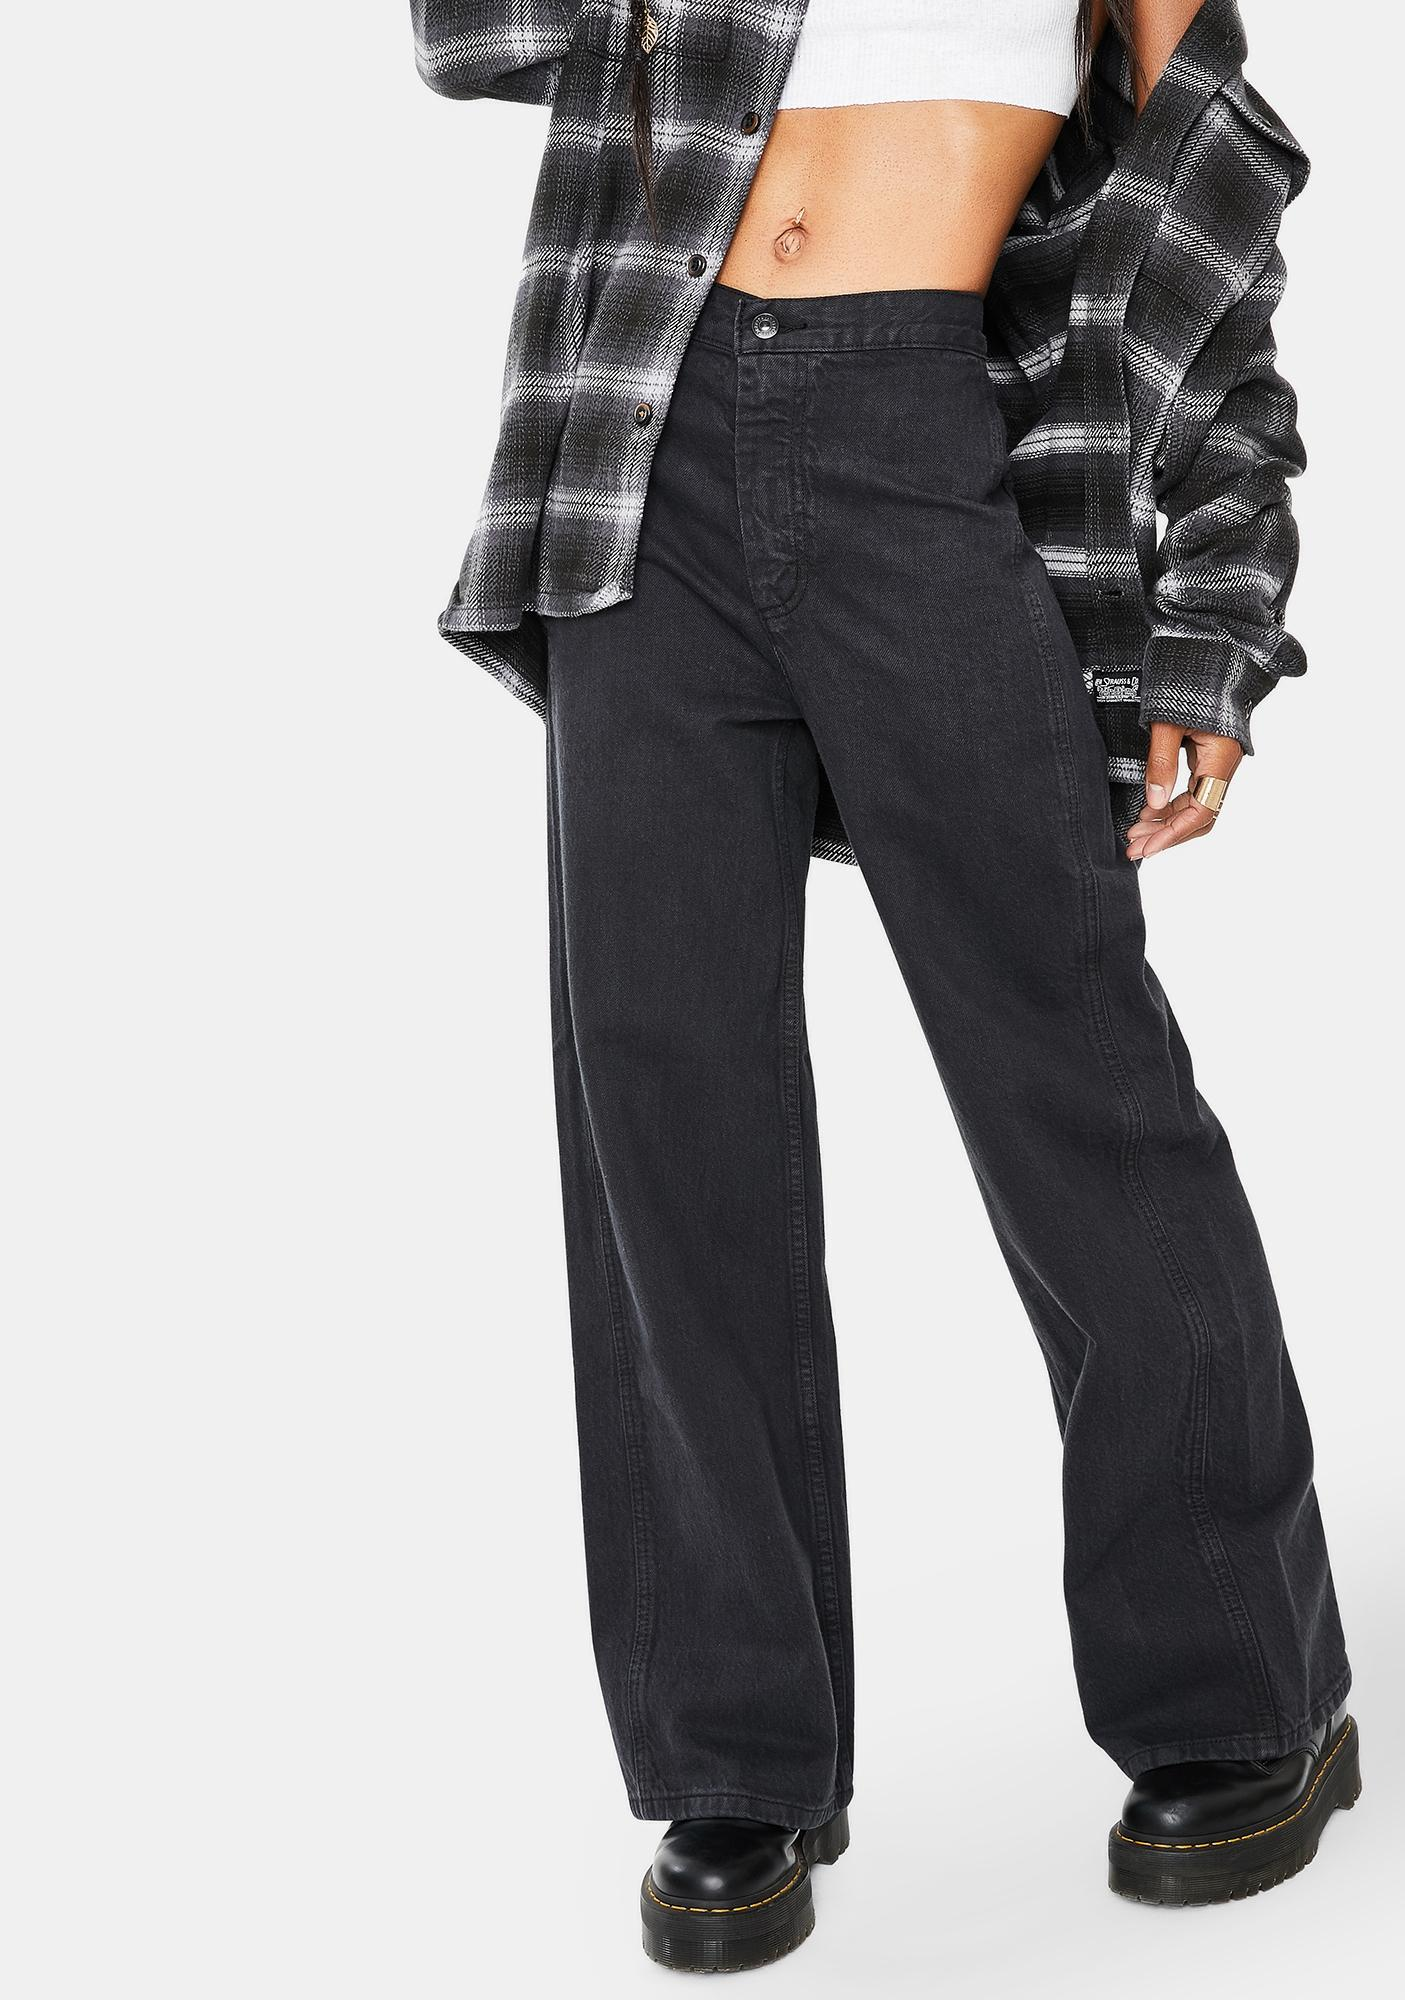 Levis Black Hemp Altered Wide Leg Jeans